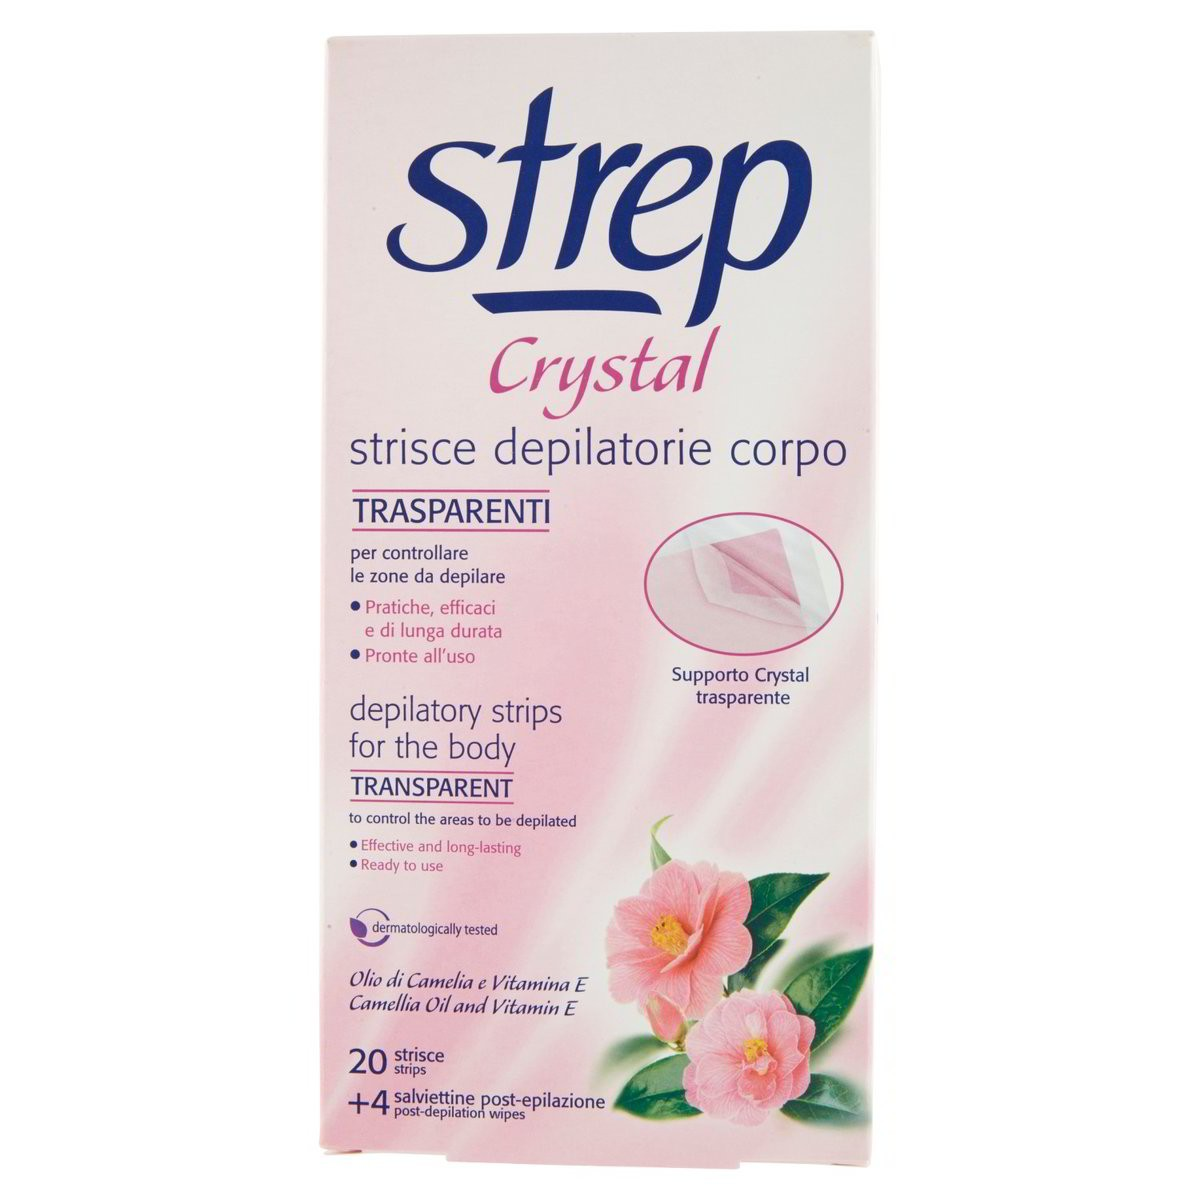 Strep Strisce depilatorie Crystal